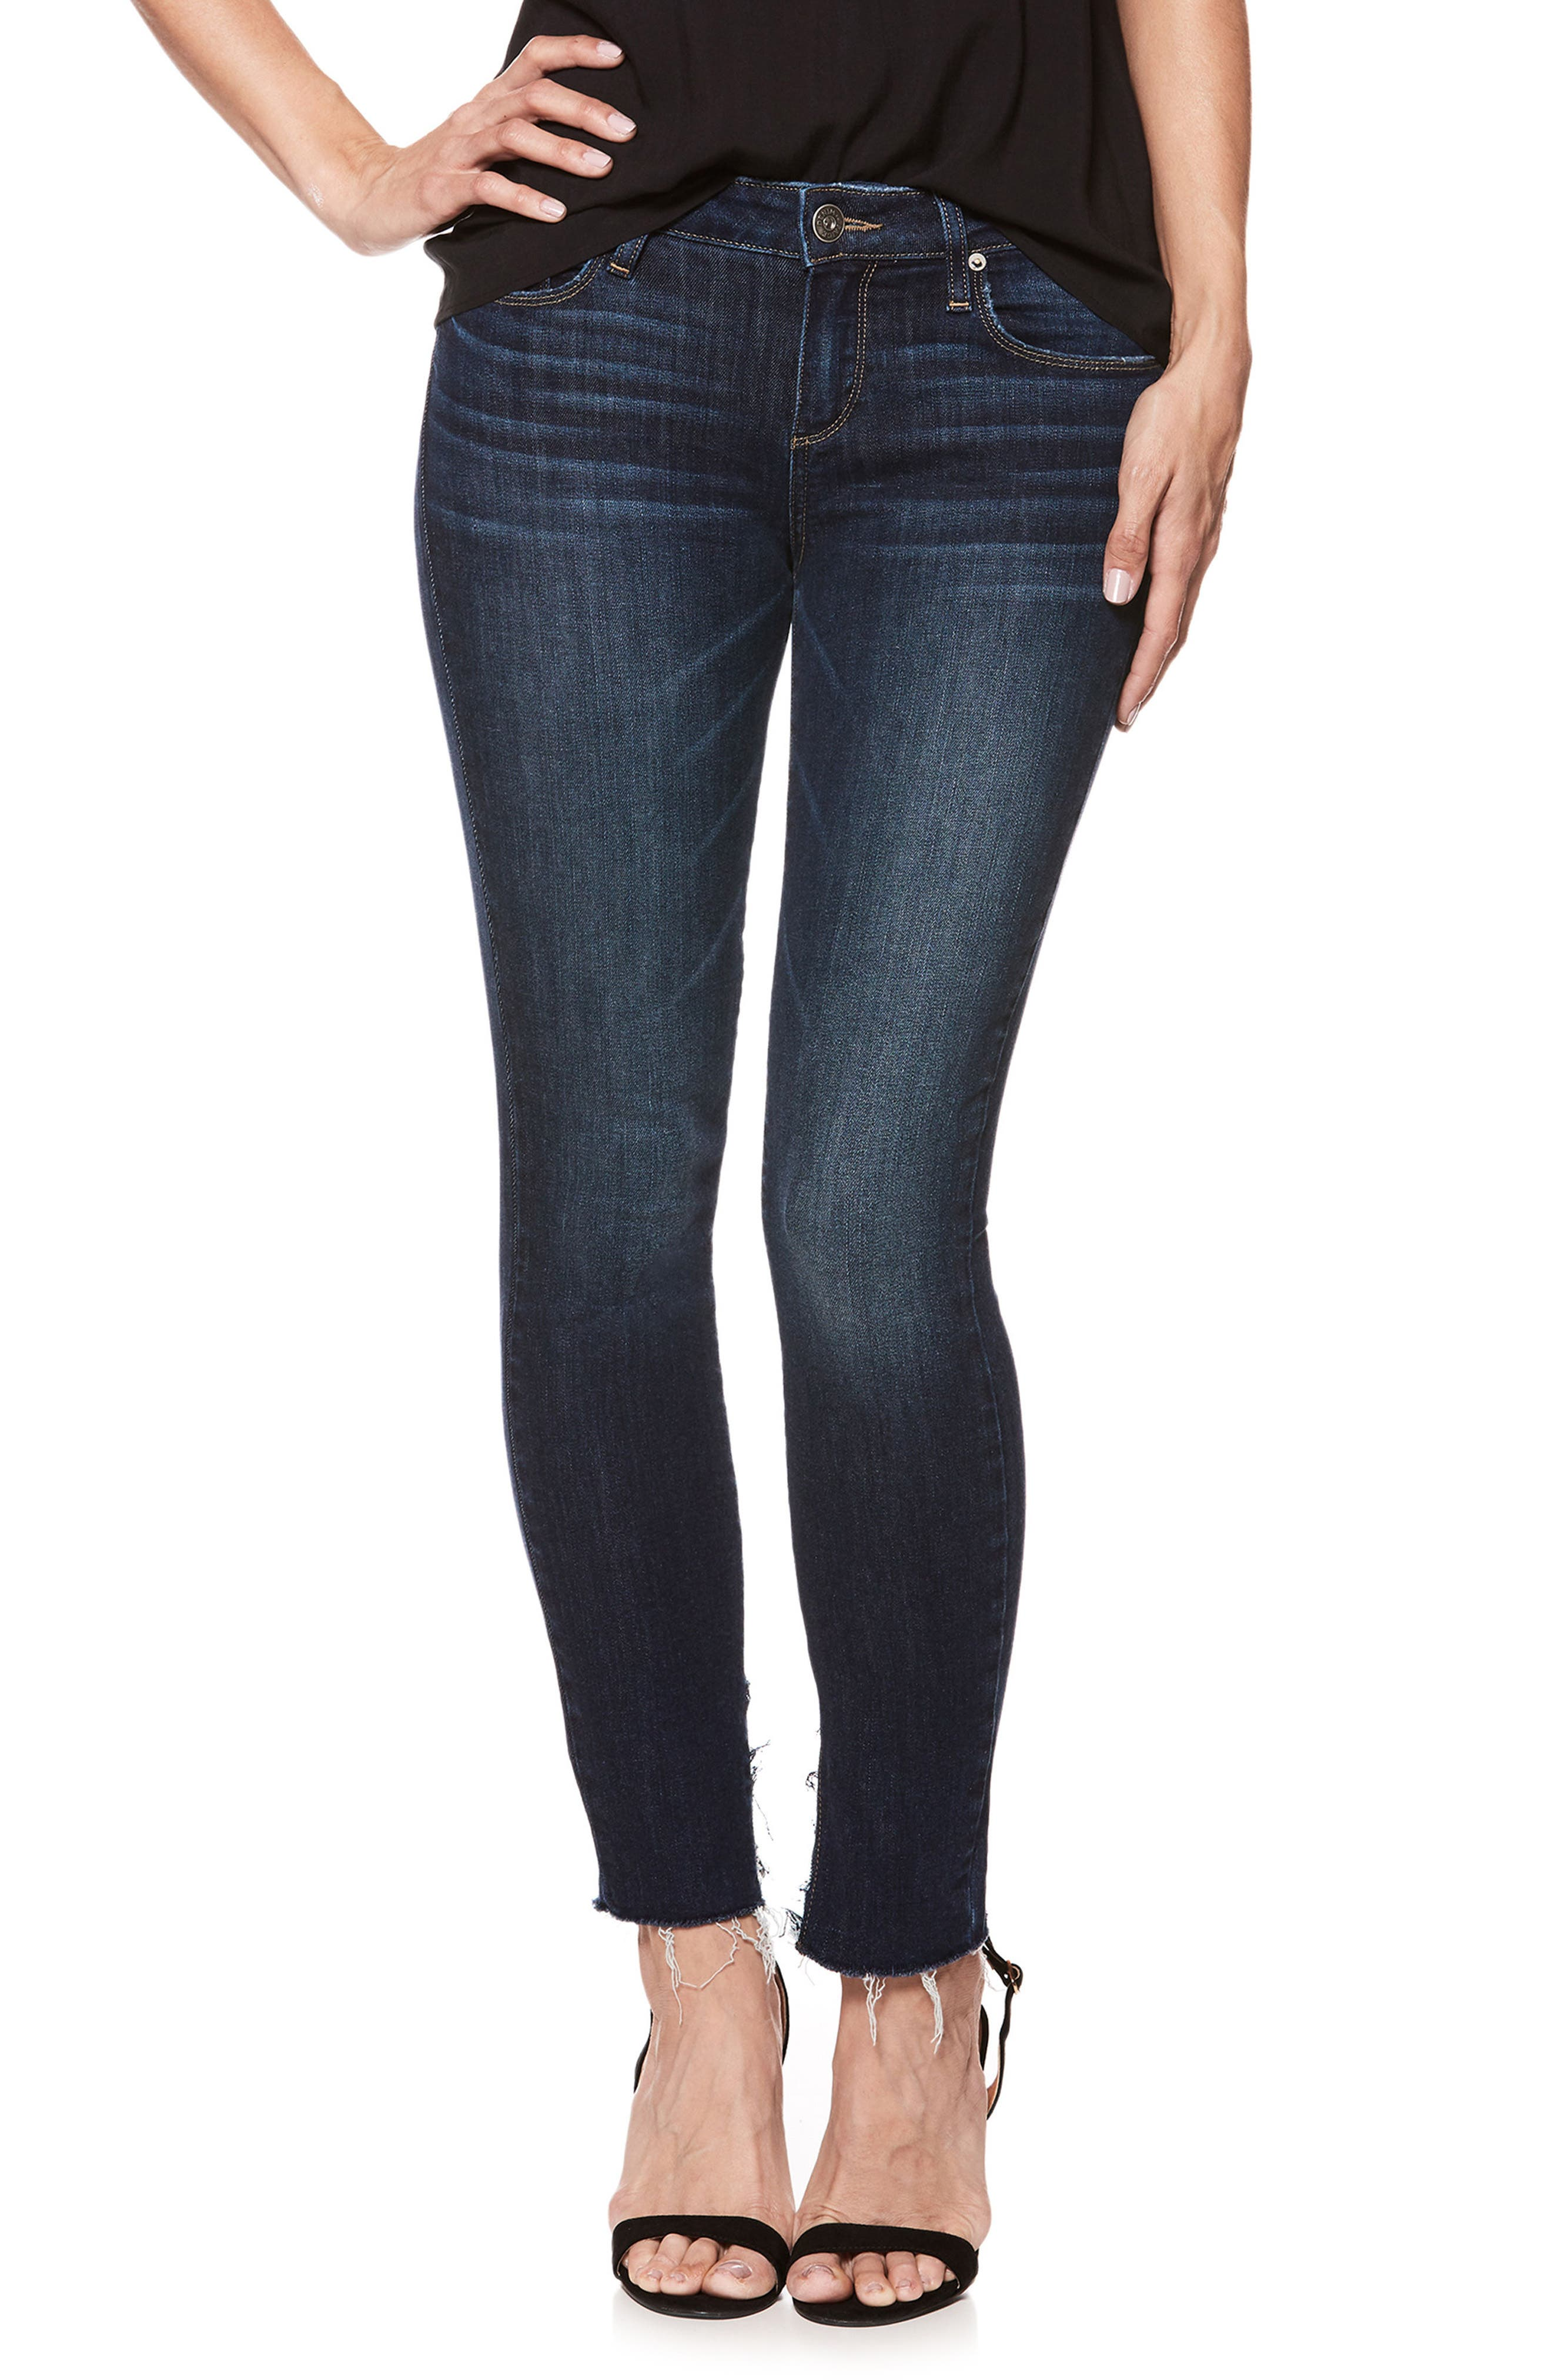 Transcend Vintage - Verdugo Ankle Ultra Skinny Jeans,                             Main thumbnail 1, color,                             400